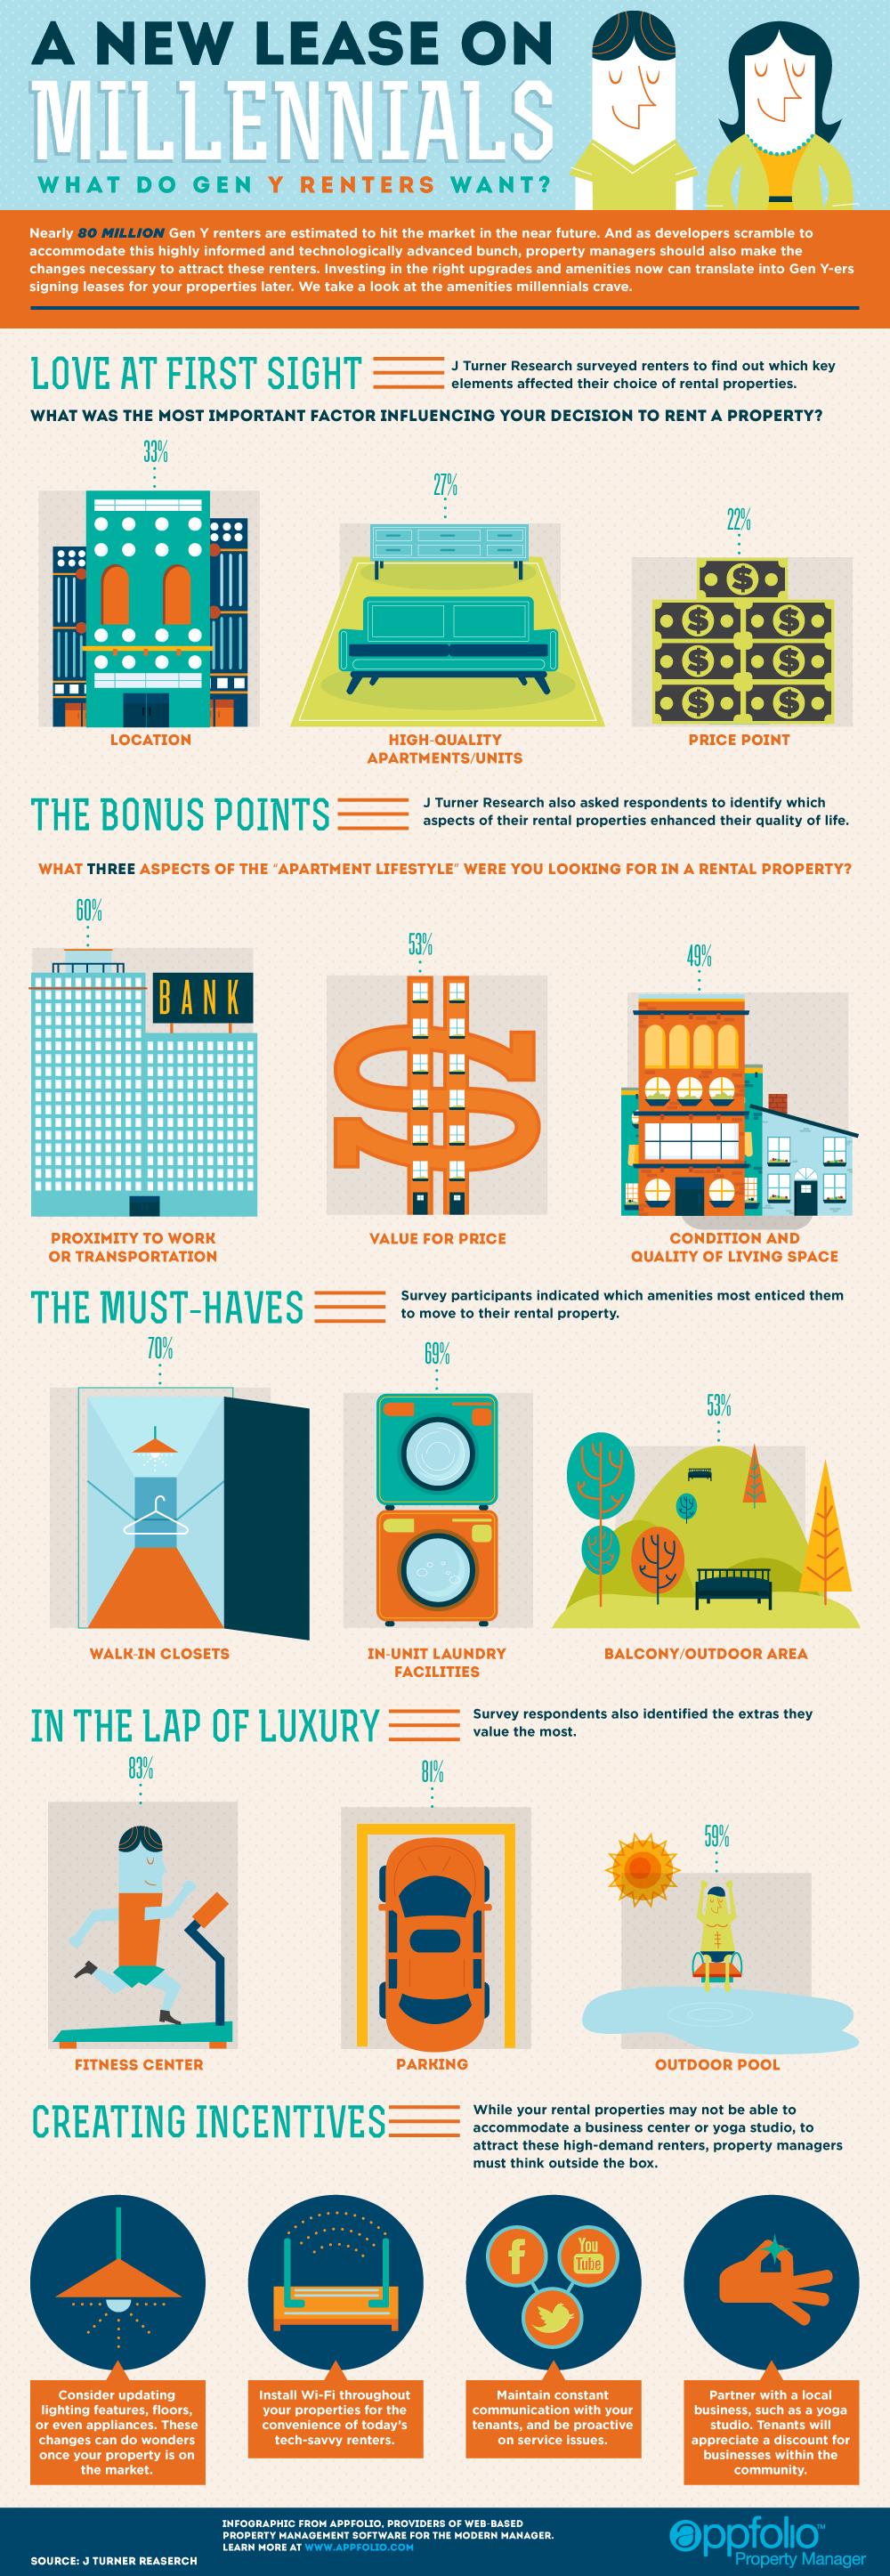 How Large Is Property Management Market